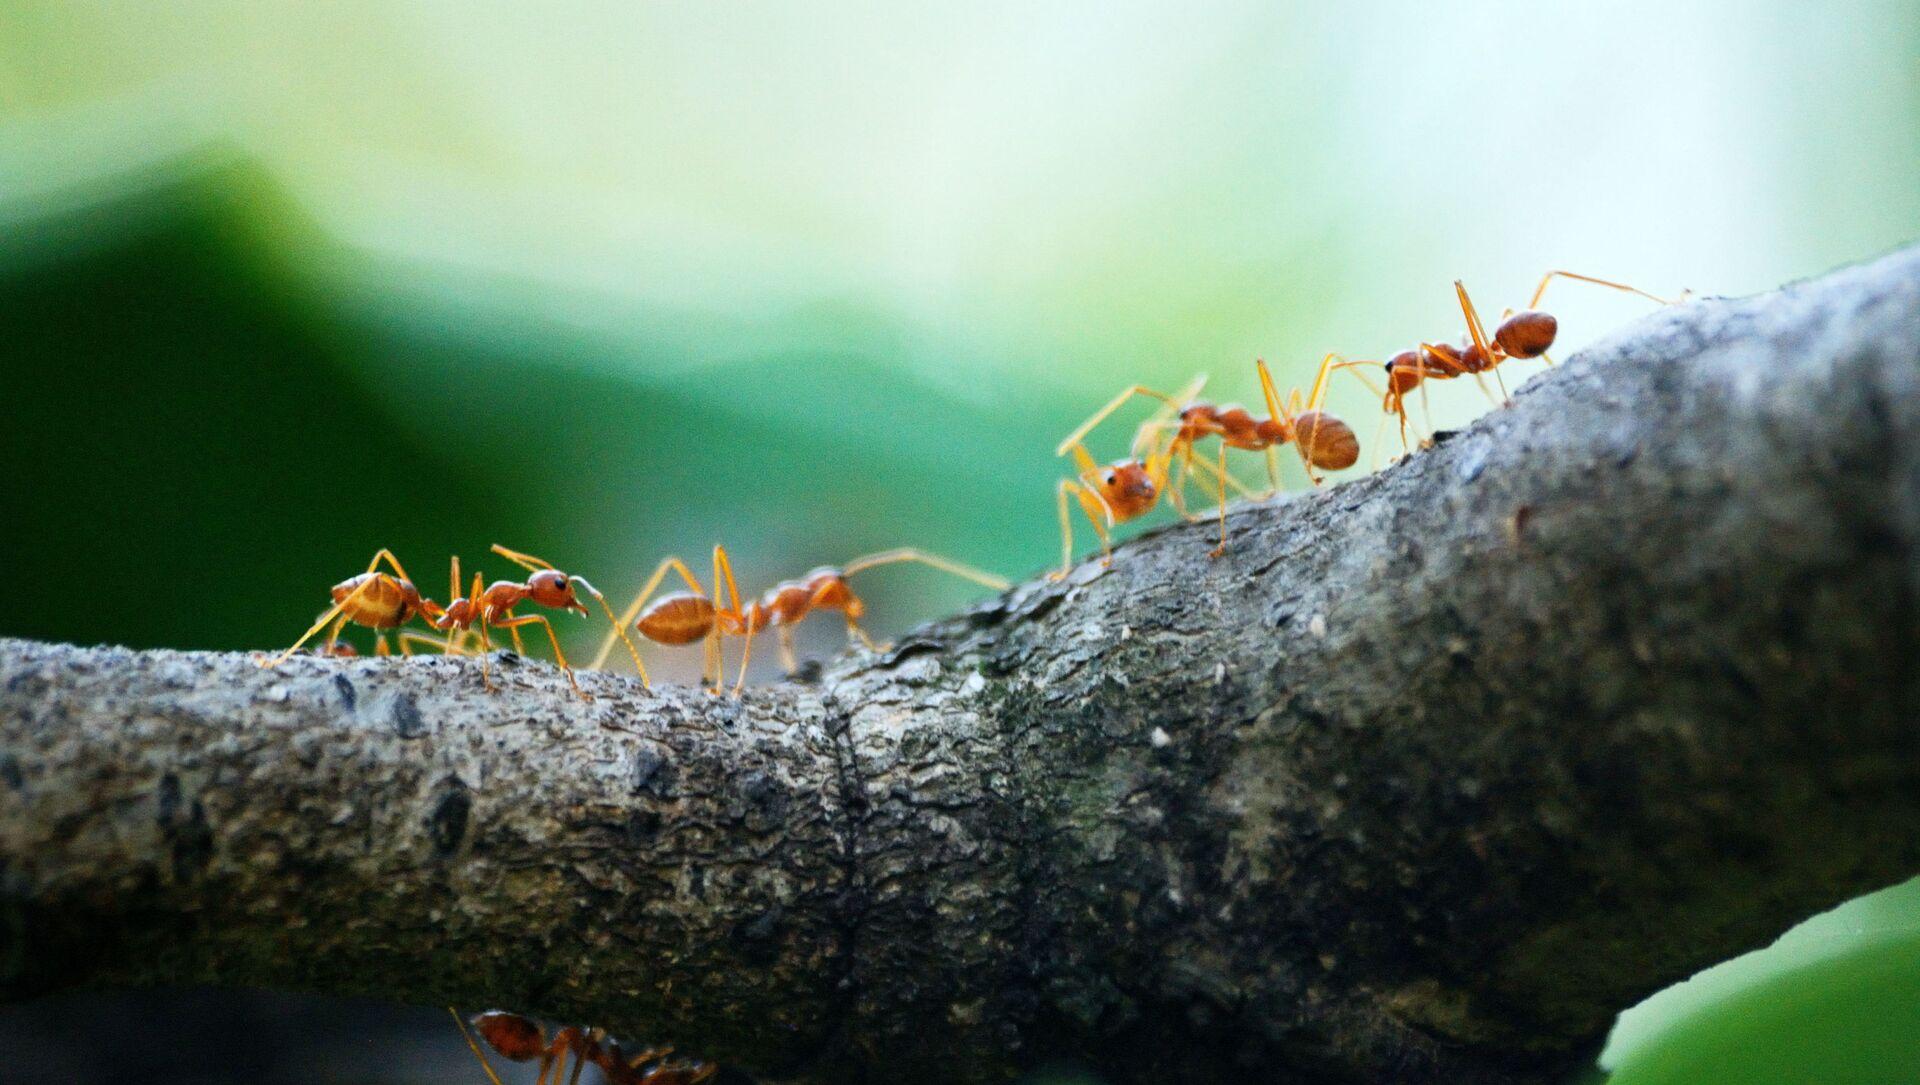 Unas hormigas - Sputnik Mundo, 1920, 05.02.2021